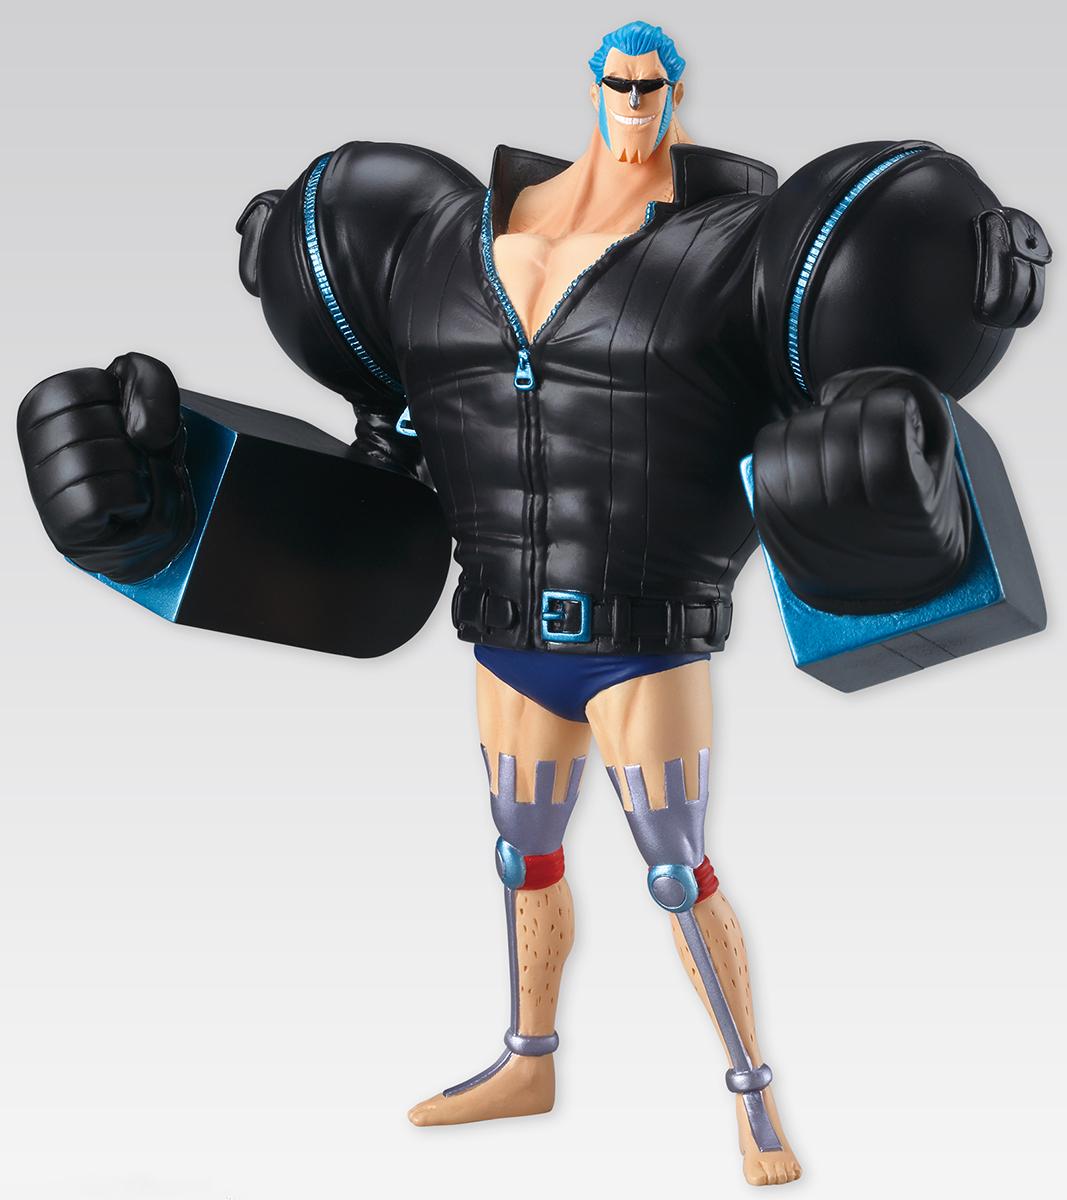 Bandai Фигурка One Piece Super Styling Film Gold Franky фигурка amiibo super smash bros король дидиди